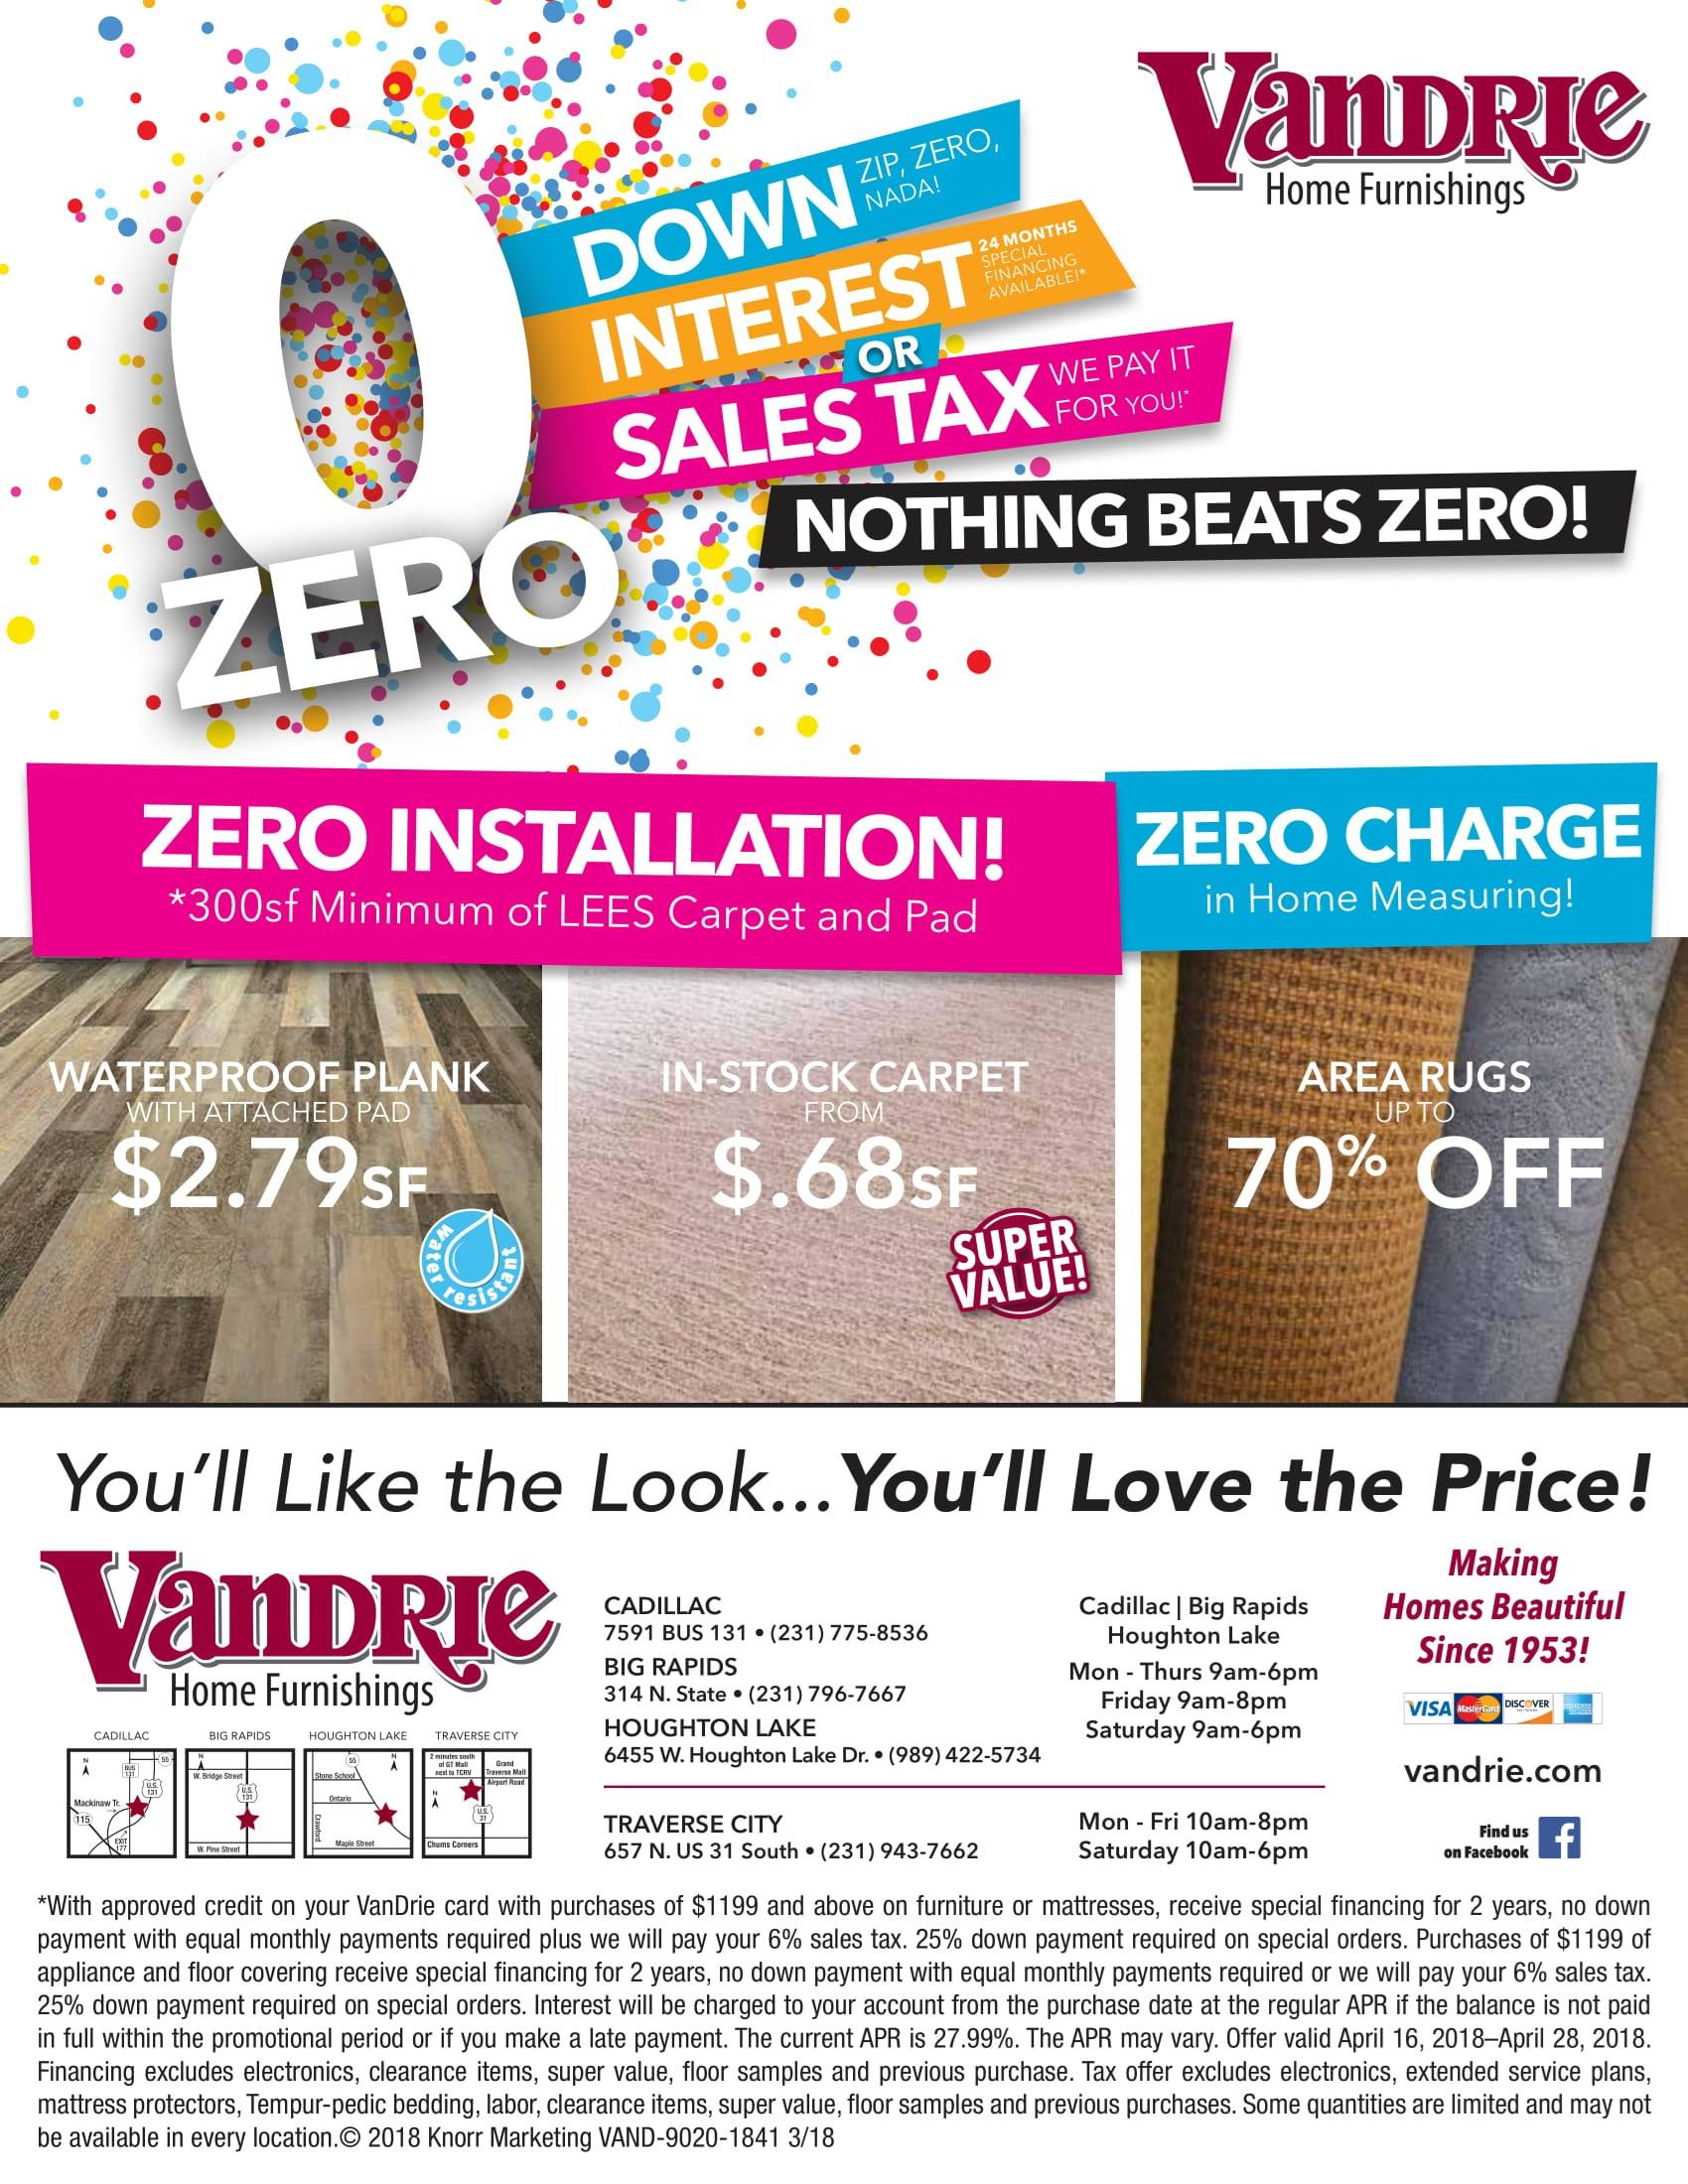 Triple Zero Sale